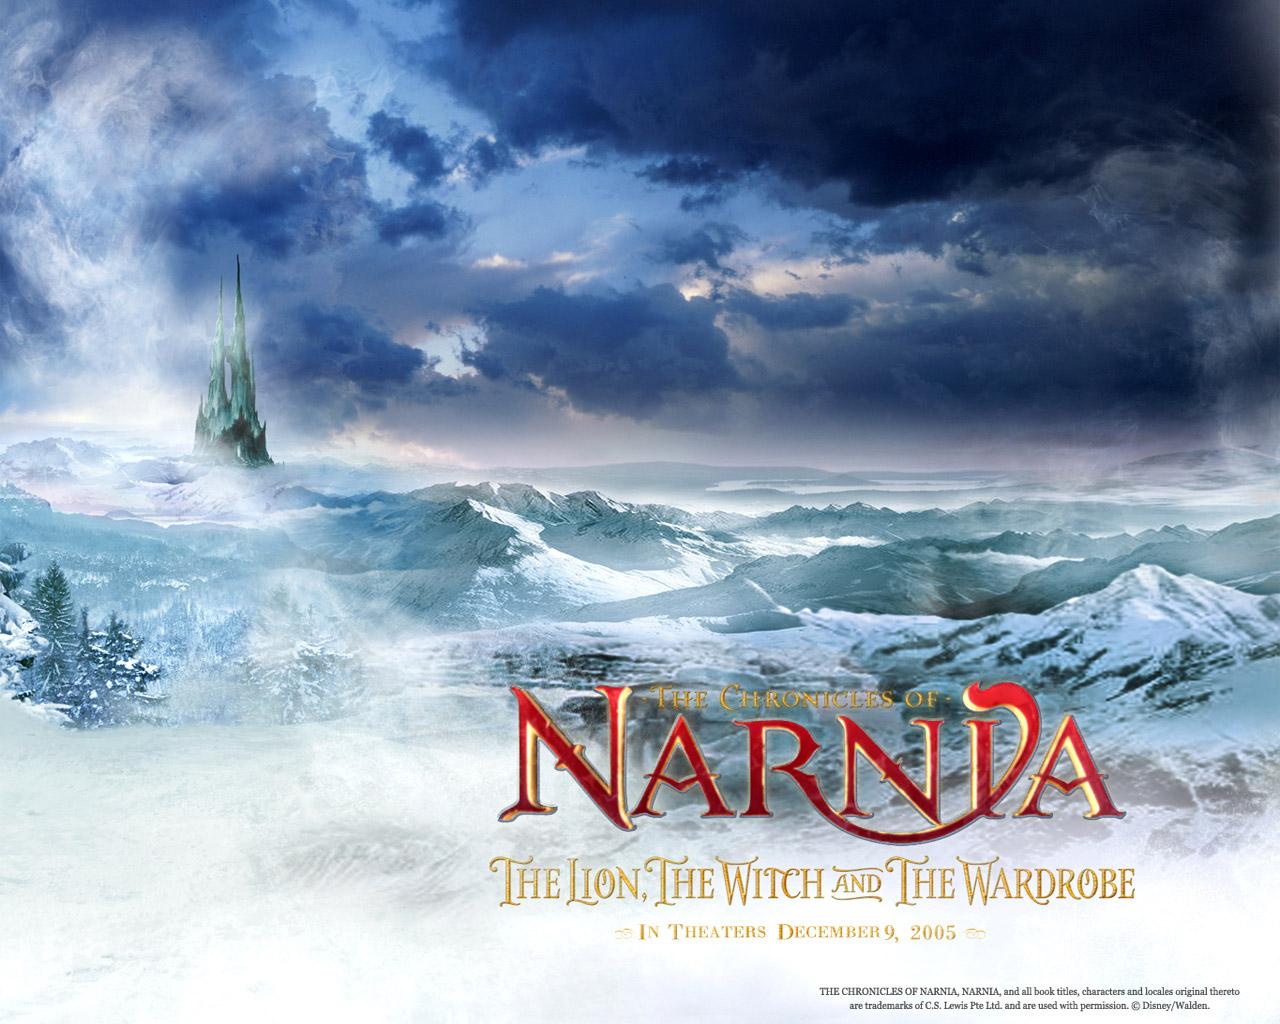 Narnia winter scenery wallpapers Narnia winter scenery stock photos 1280x1024